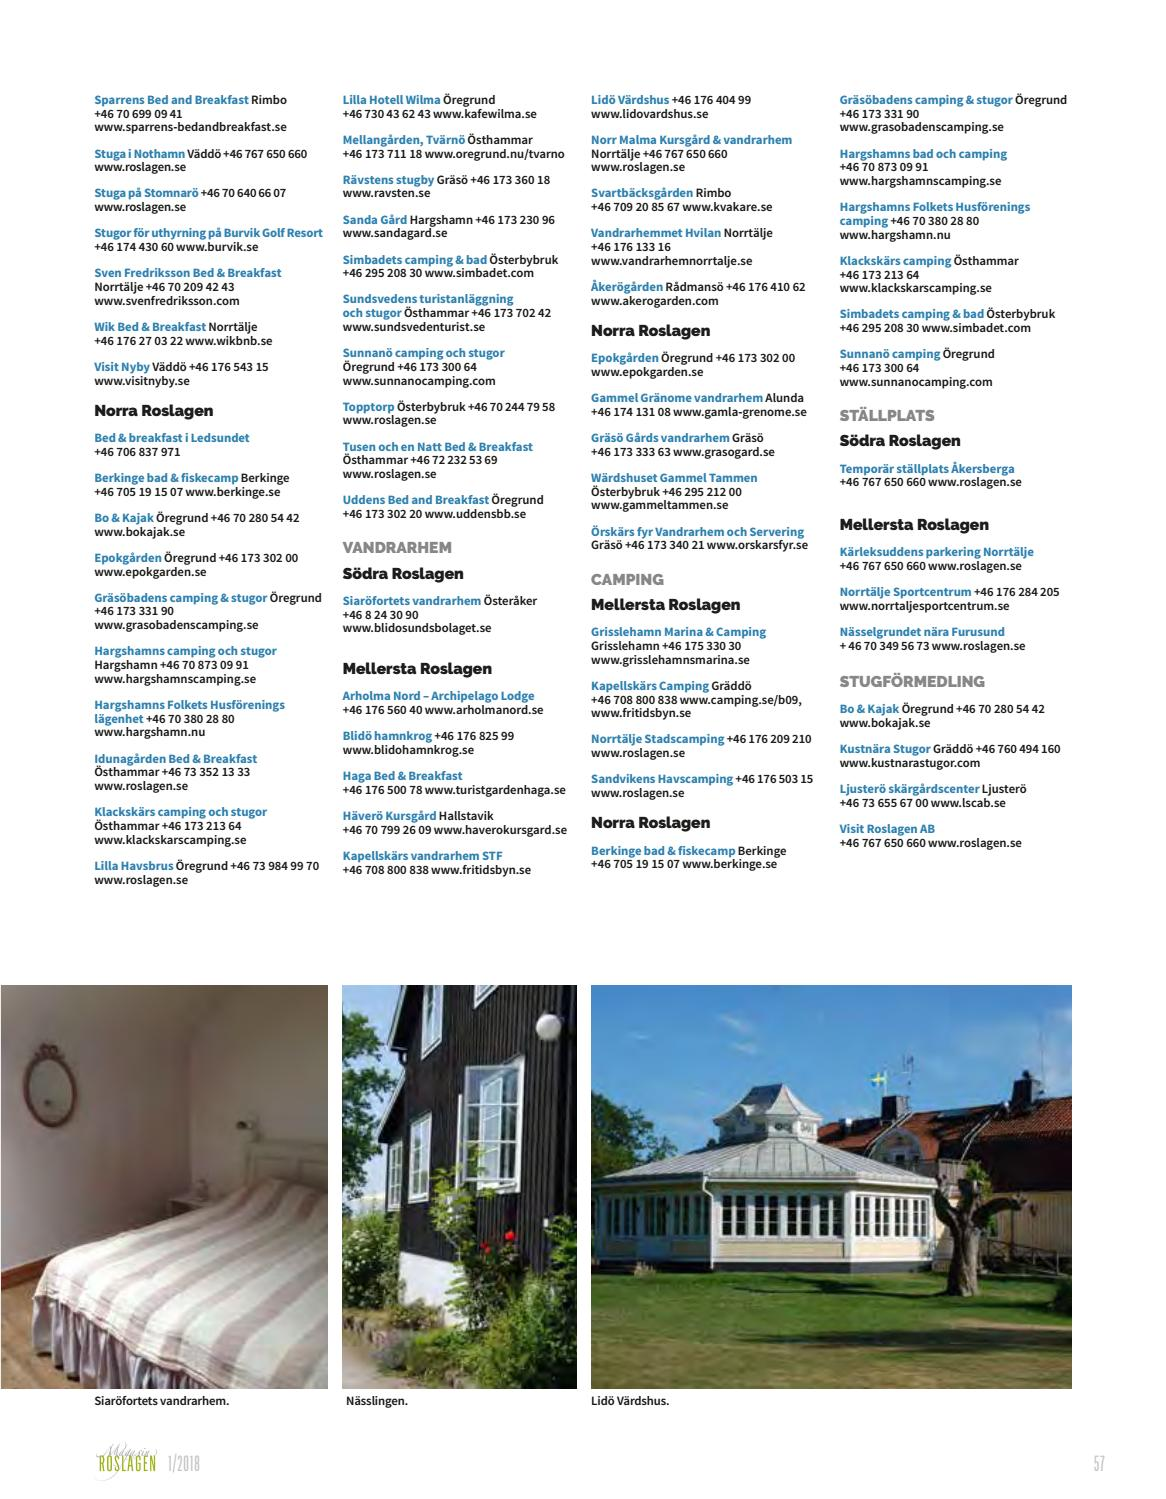 Magasin Roslagen 2018 By Visit Roslagen Issuu